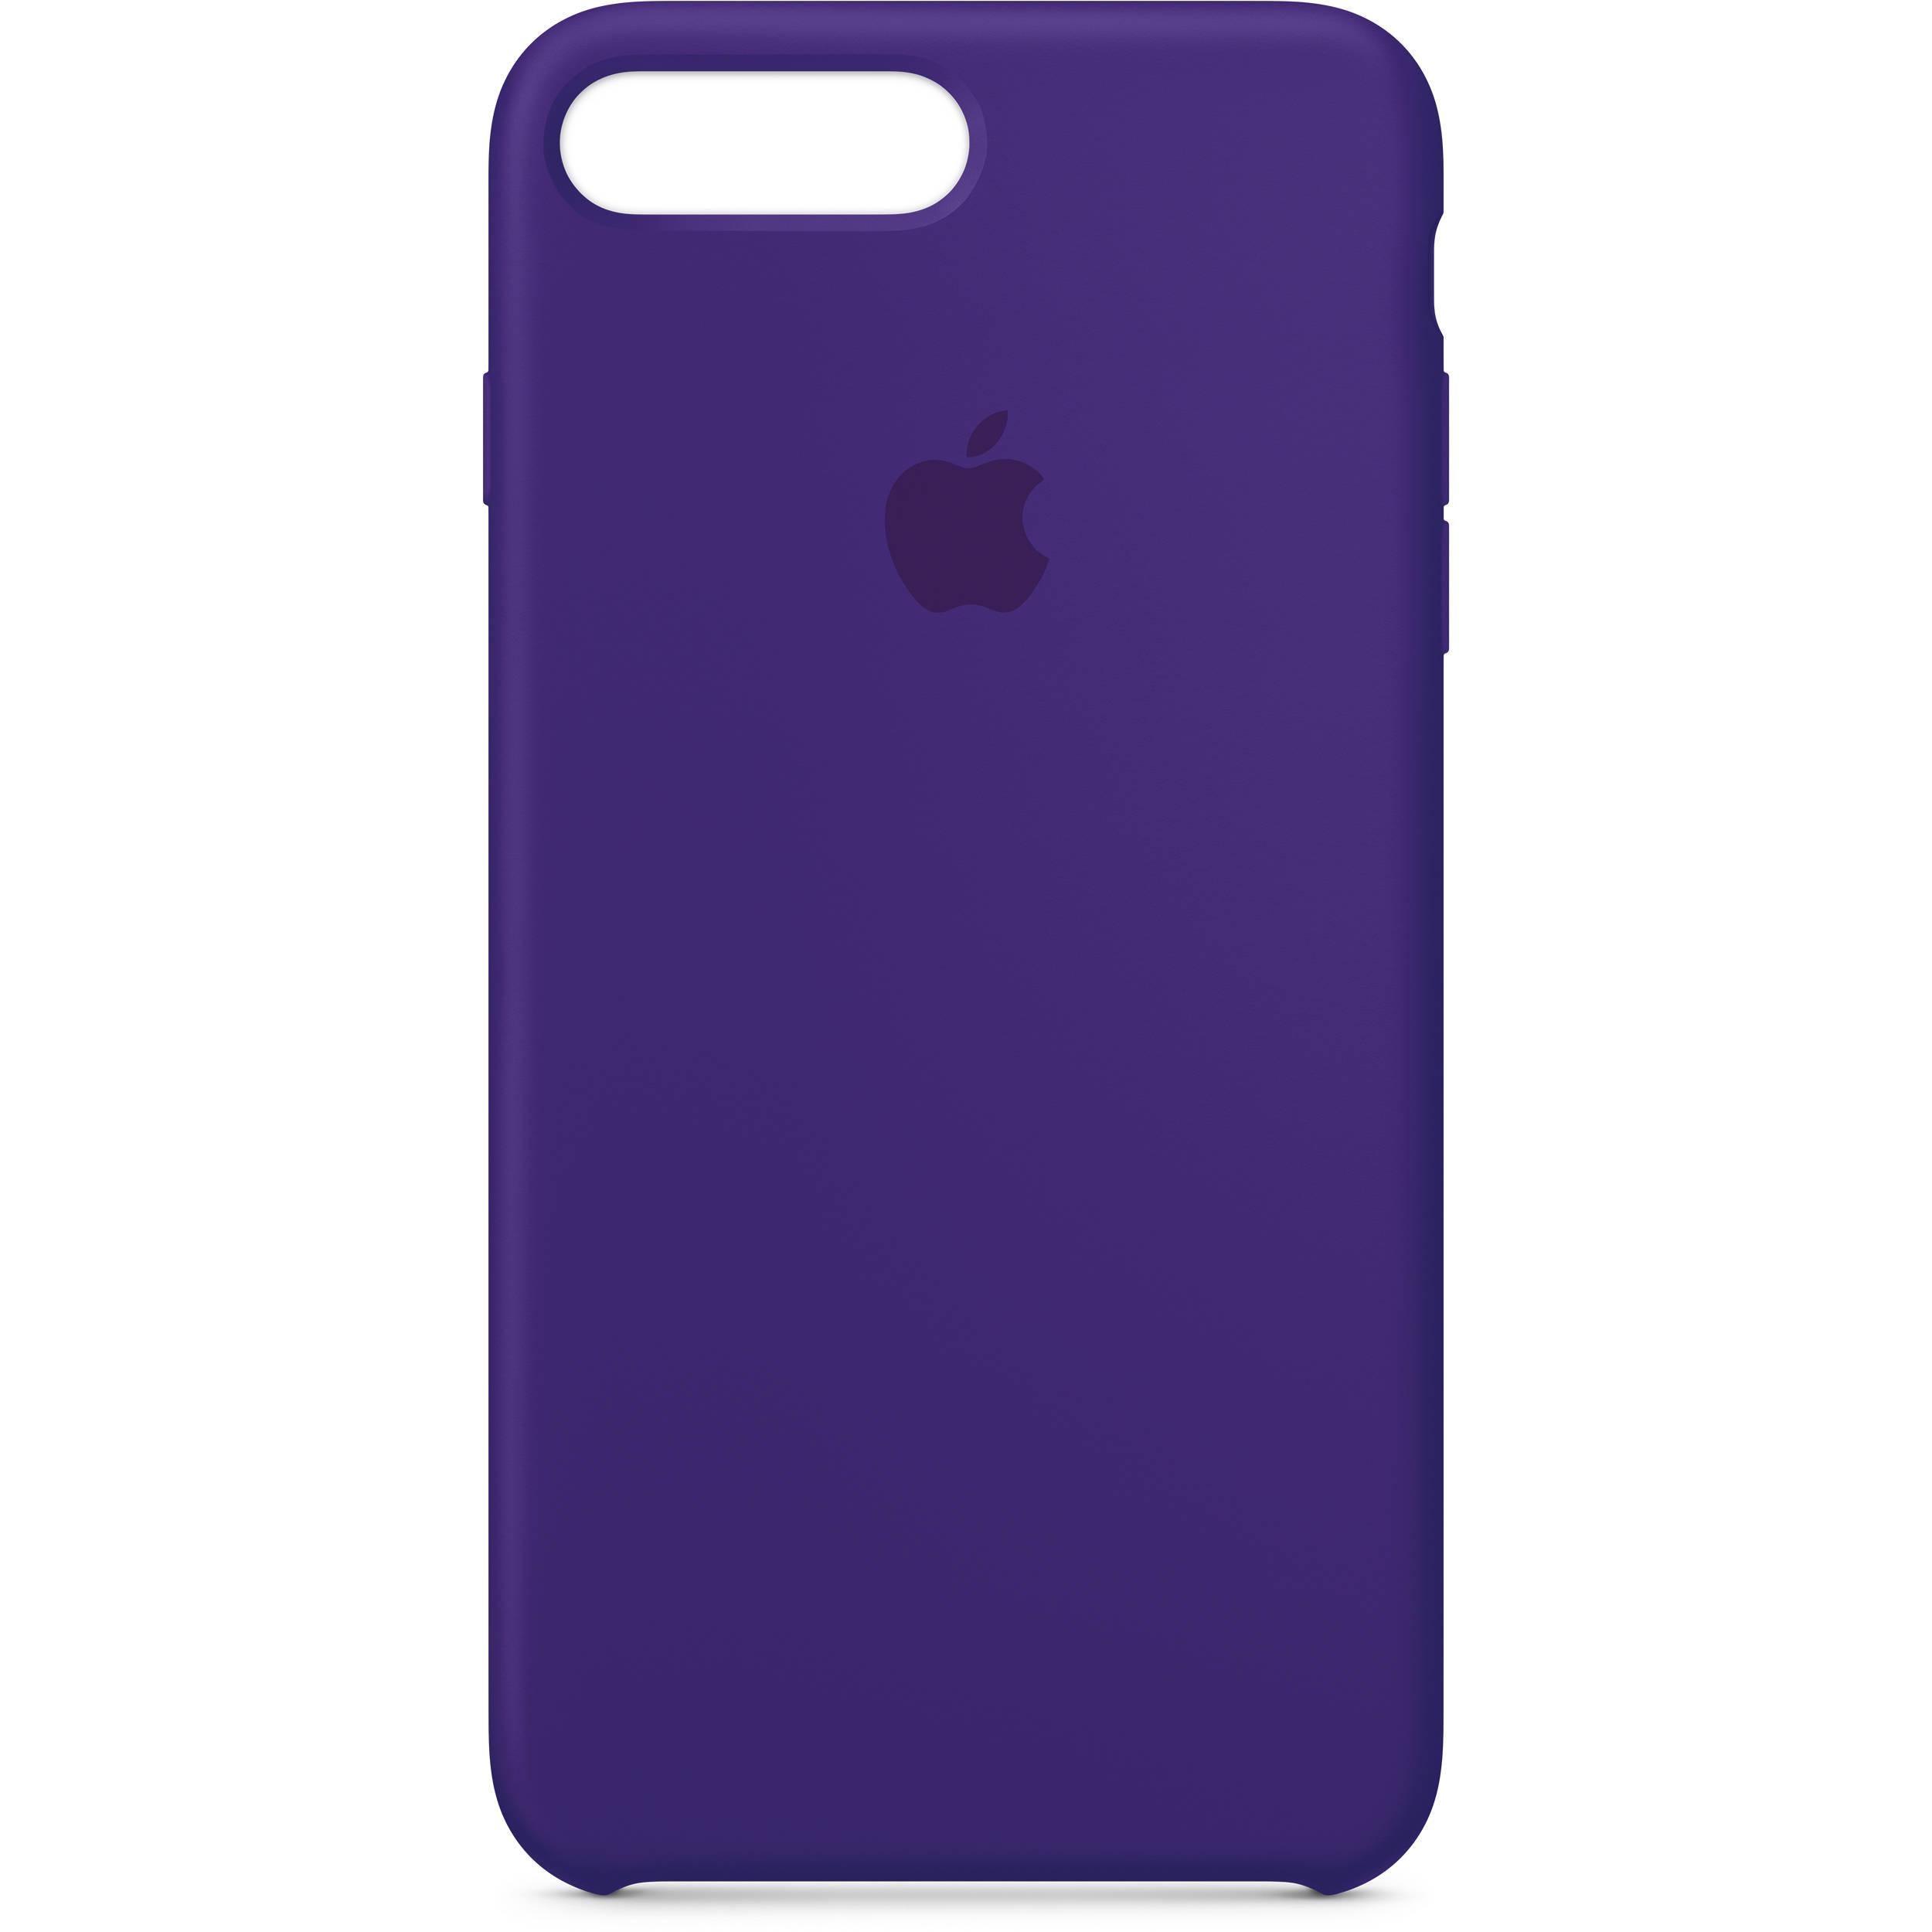 the best attitude b35f4 a39c1 Apple iPhone 7 Plus/8 Plus Silicone Case (Ultra Violet)